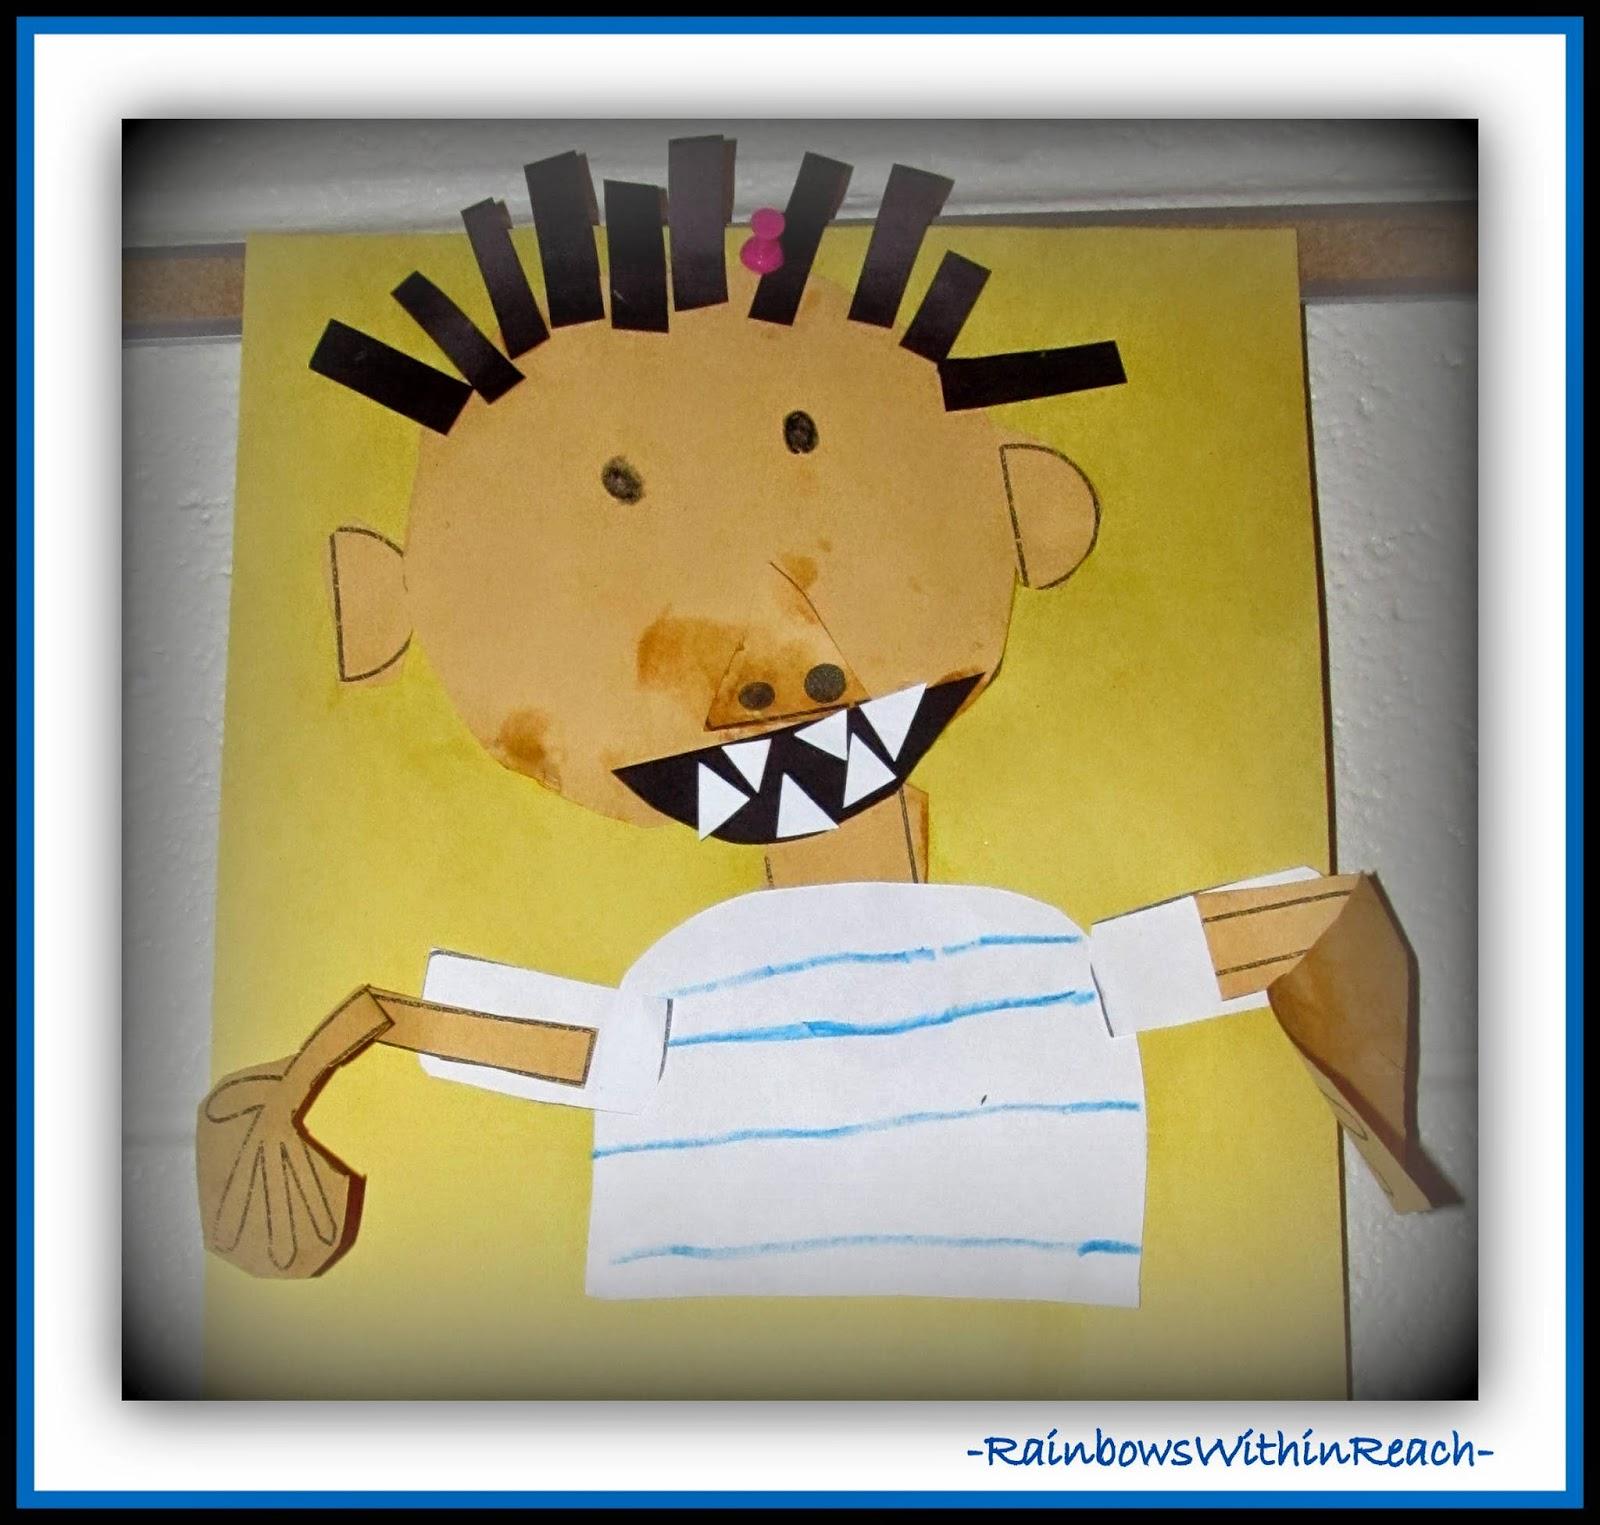 """No David!"" Kindergarten Art Response at RainbowsWithinReach"